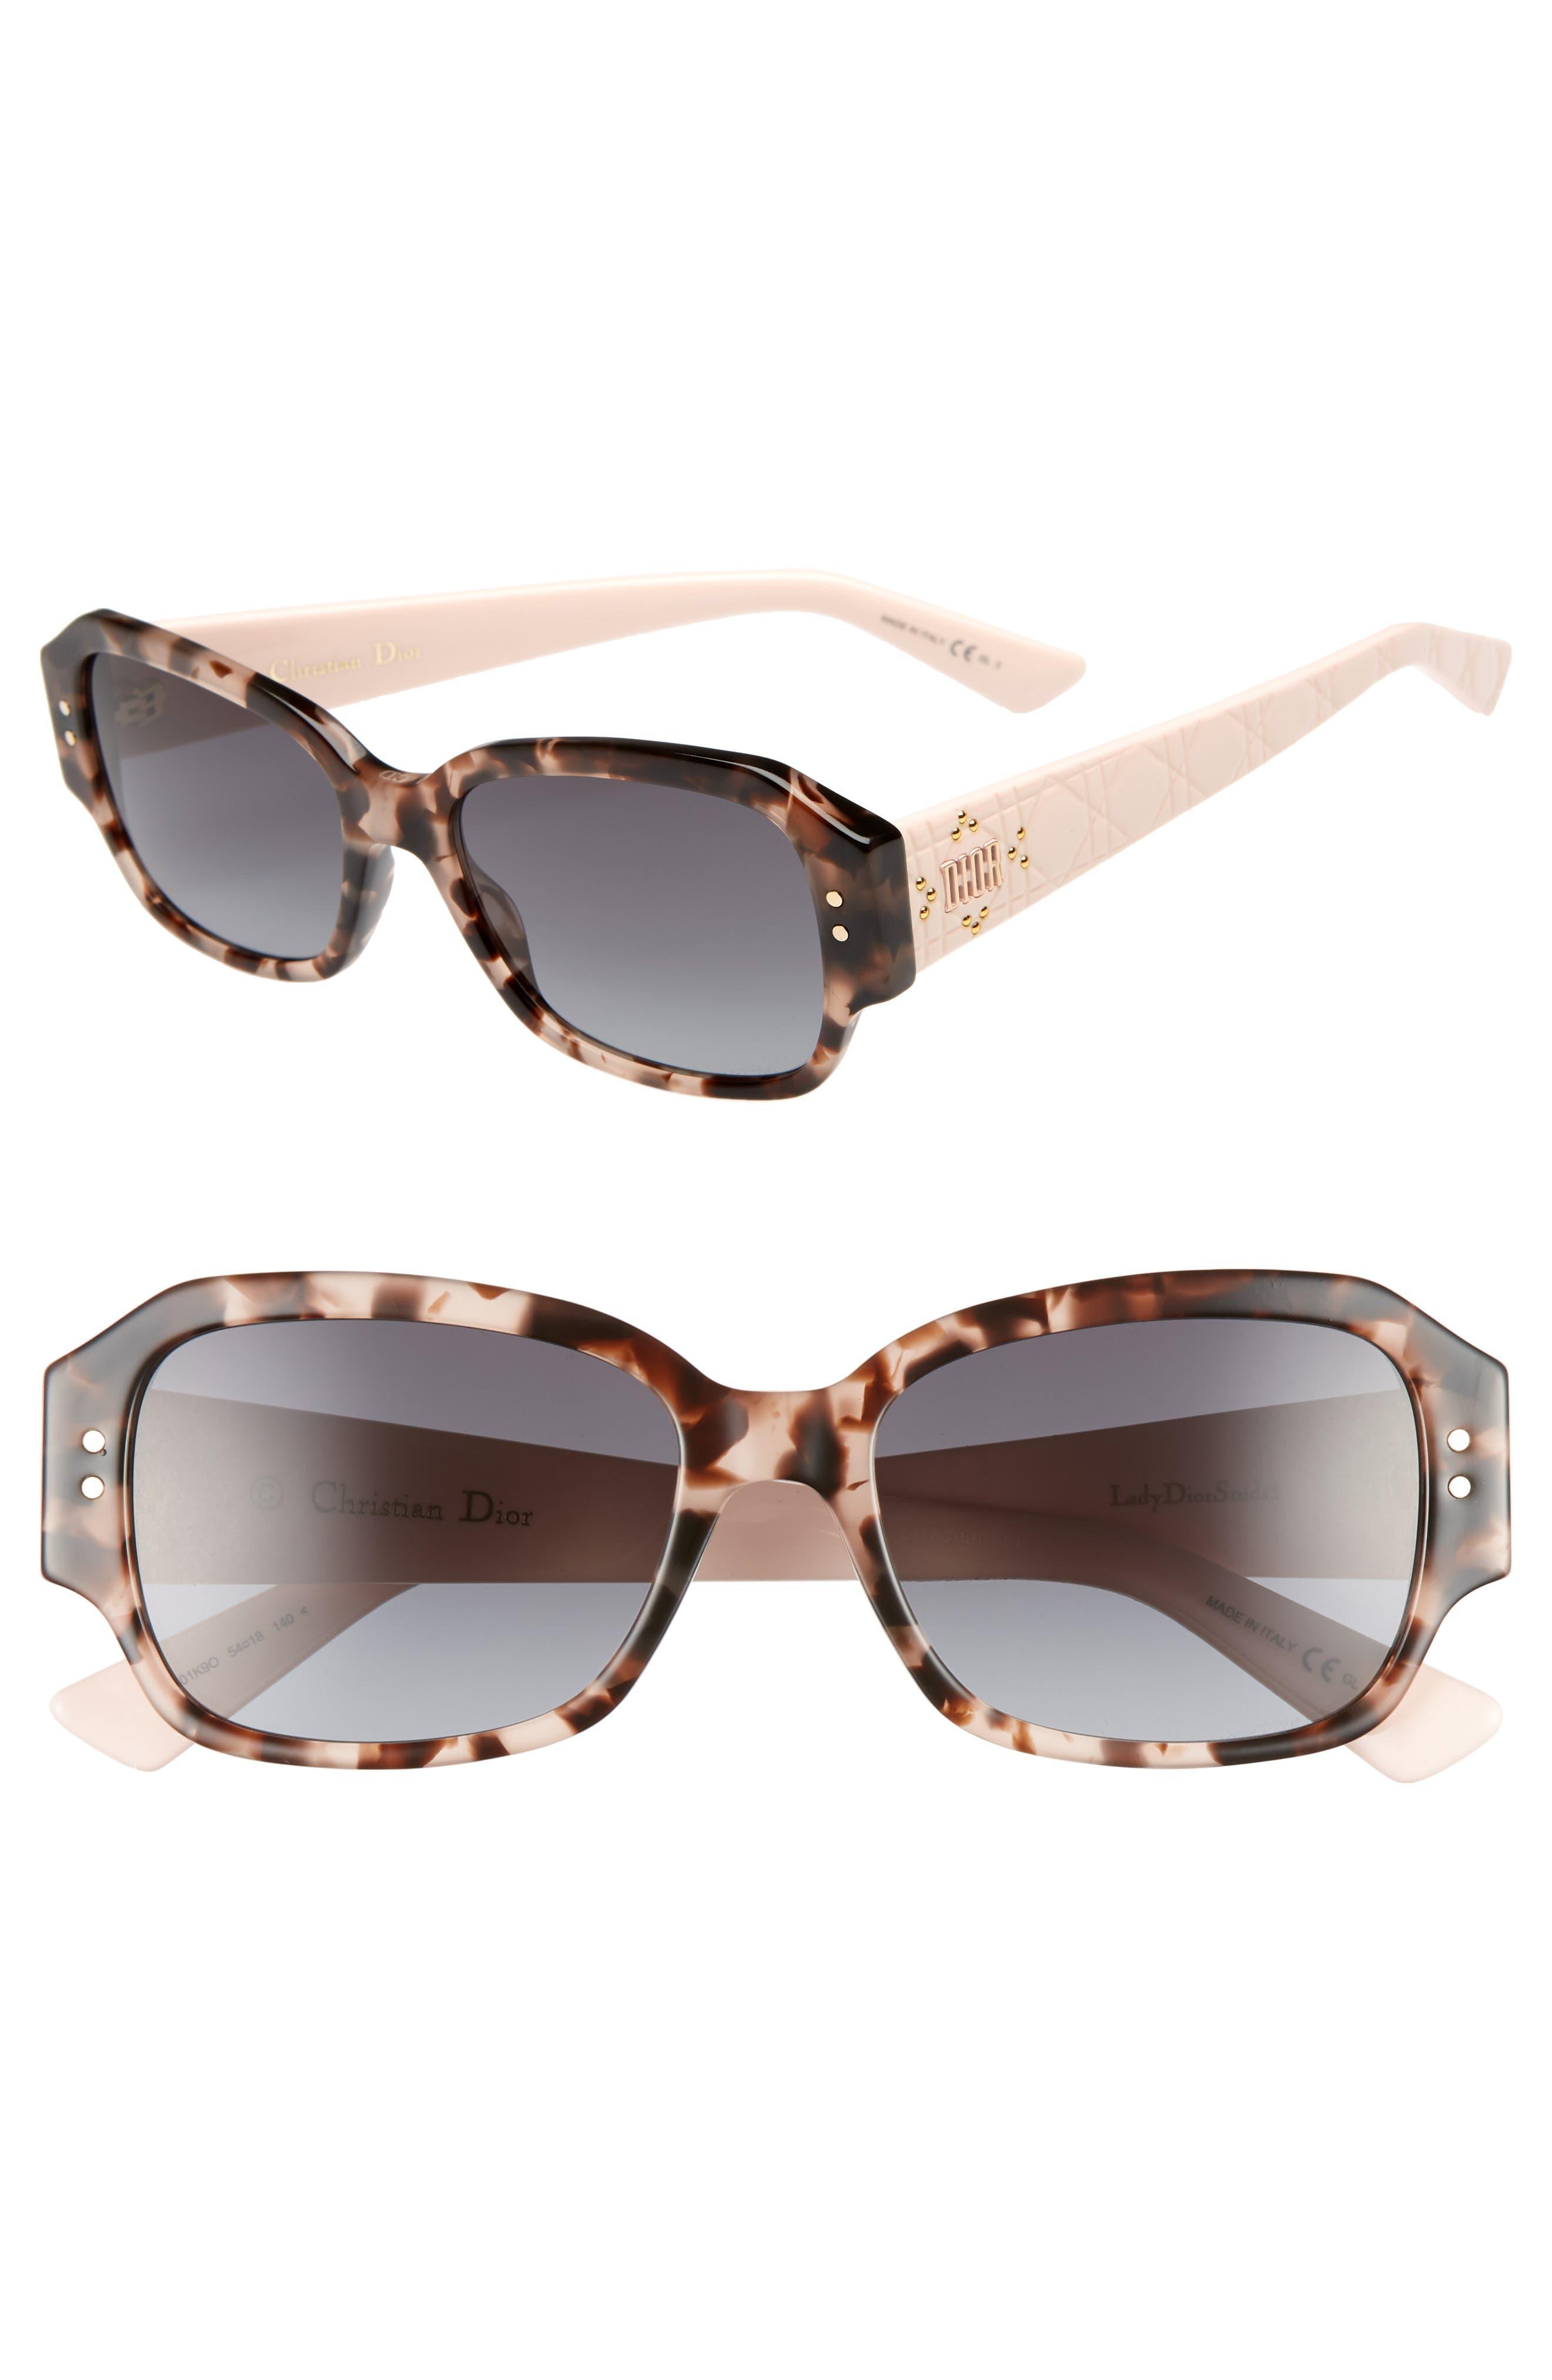 Ladydiorstuds5 54mm Sunglasses, Main, color, HAVANA LIGHT PINK